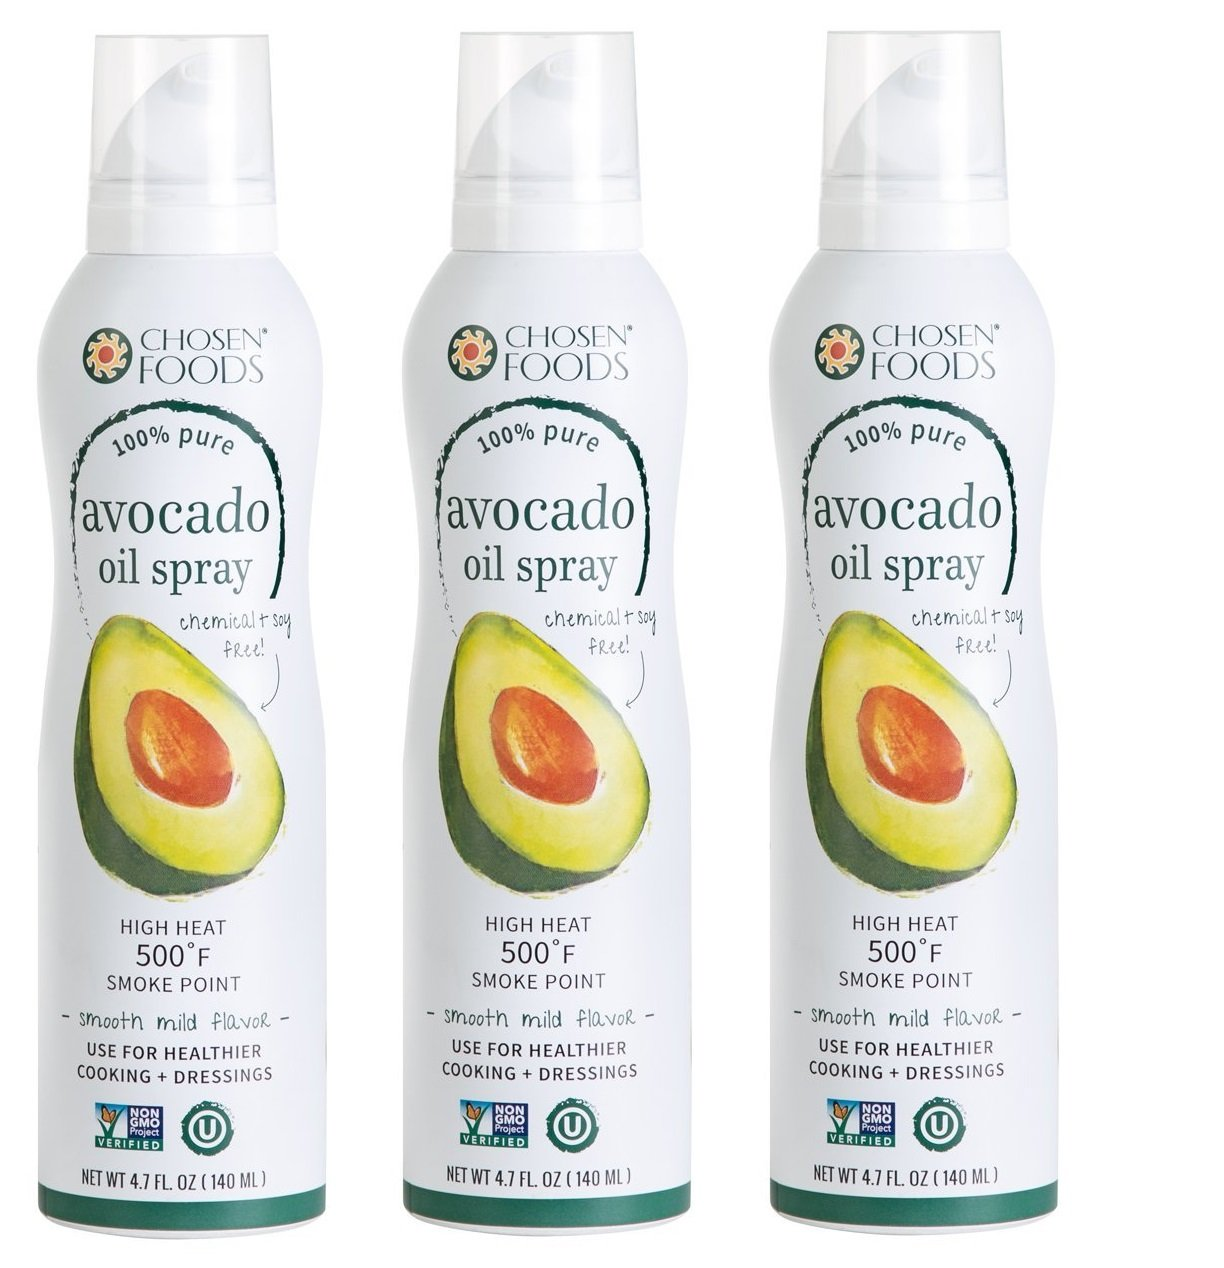 Chosen Foods Avocado Oil Spray, 4.7 Fluid Ounce (4.7 FL OZ - Pack of 3)